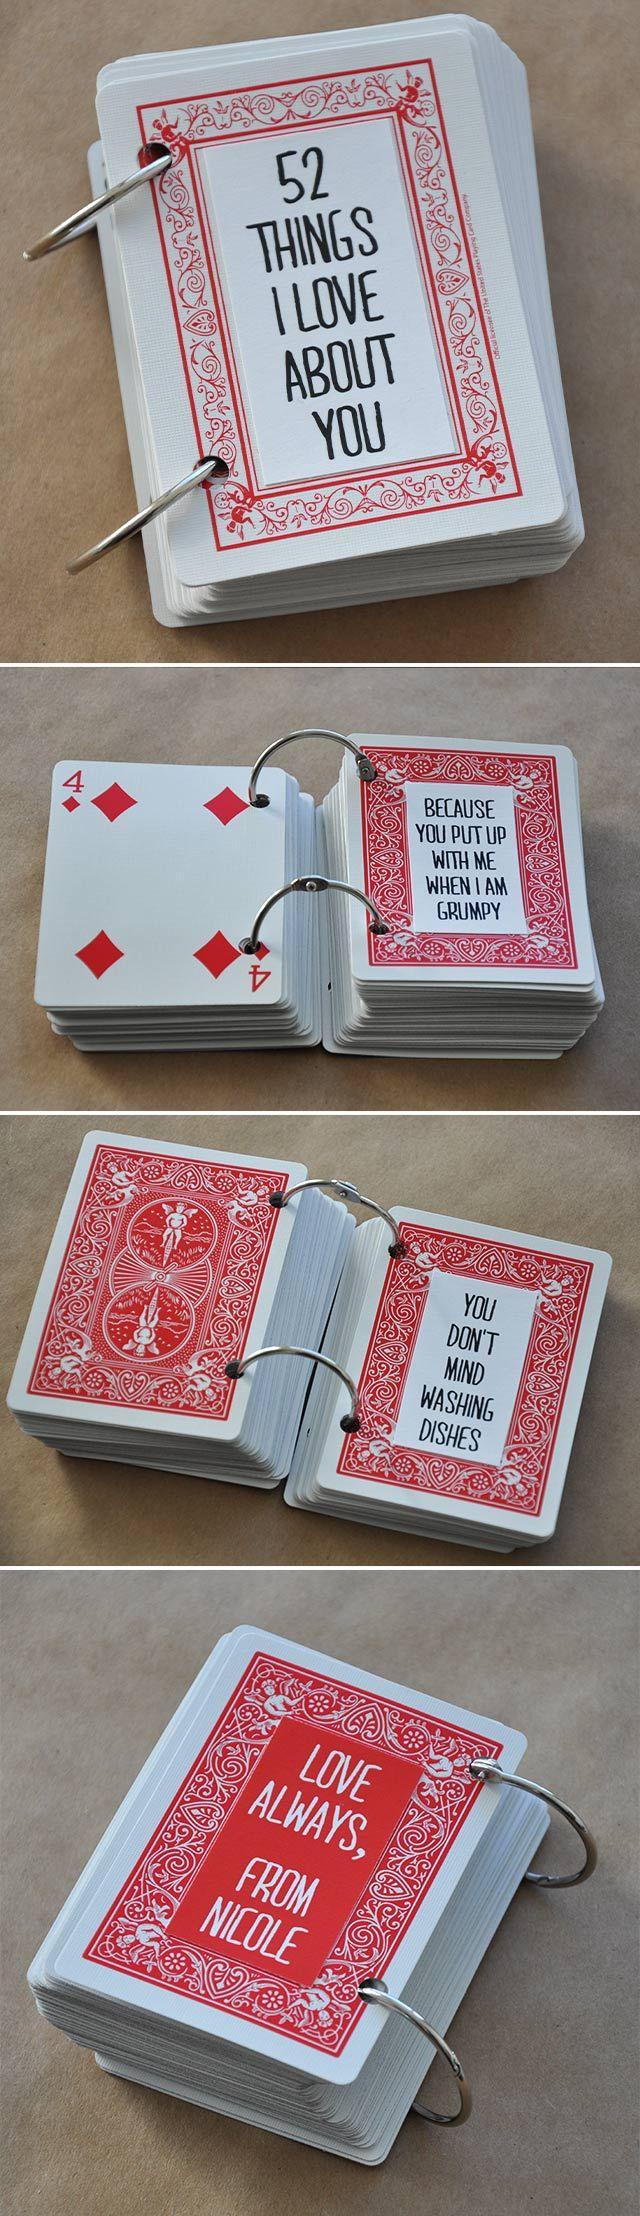 Best 10+ Homemade valentines ideas on Pinterest | Homemade ...